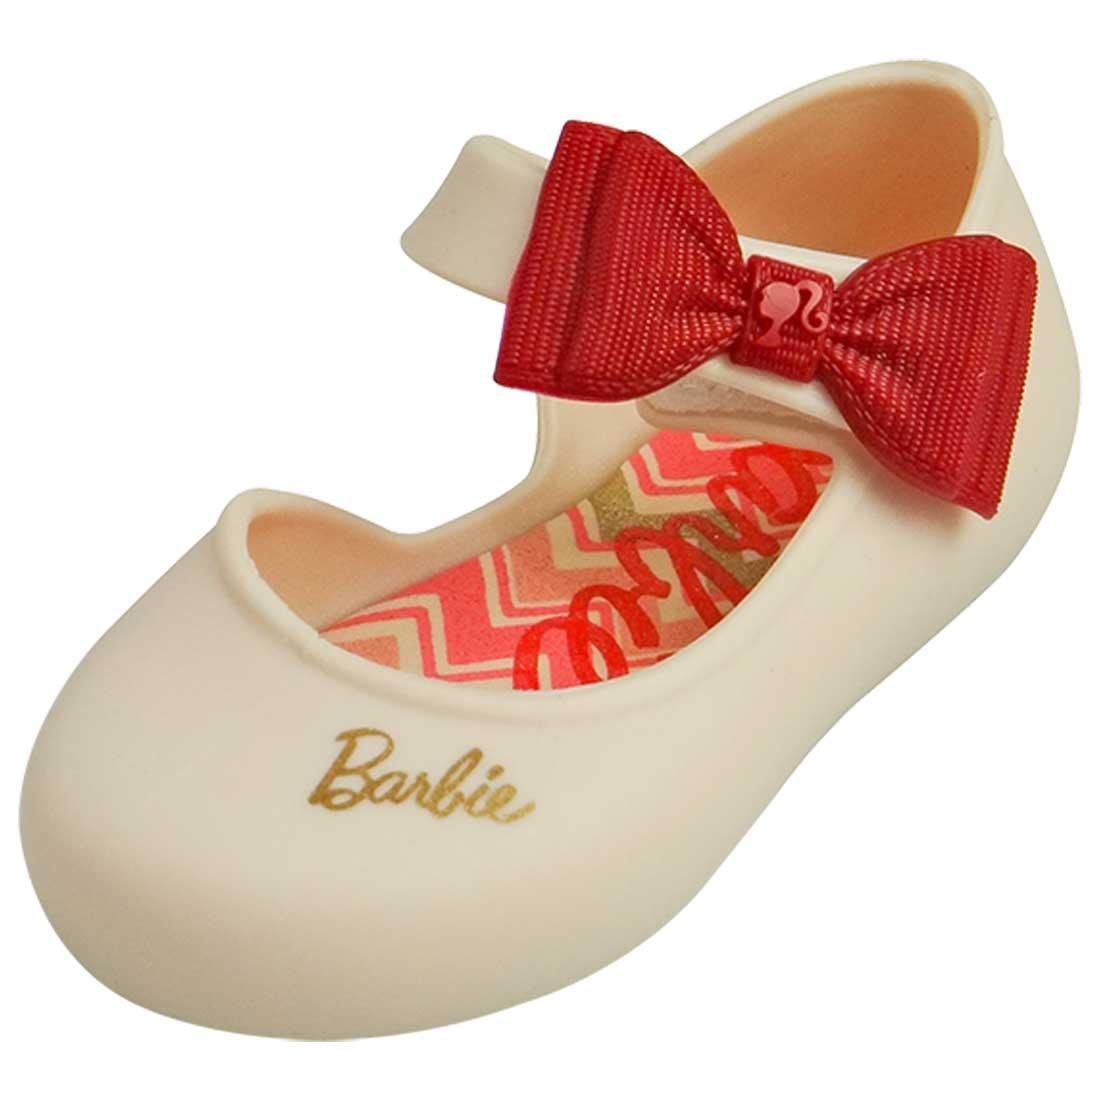 Sapatilha Boneca Baby Barbie Happy - Bege